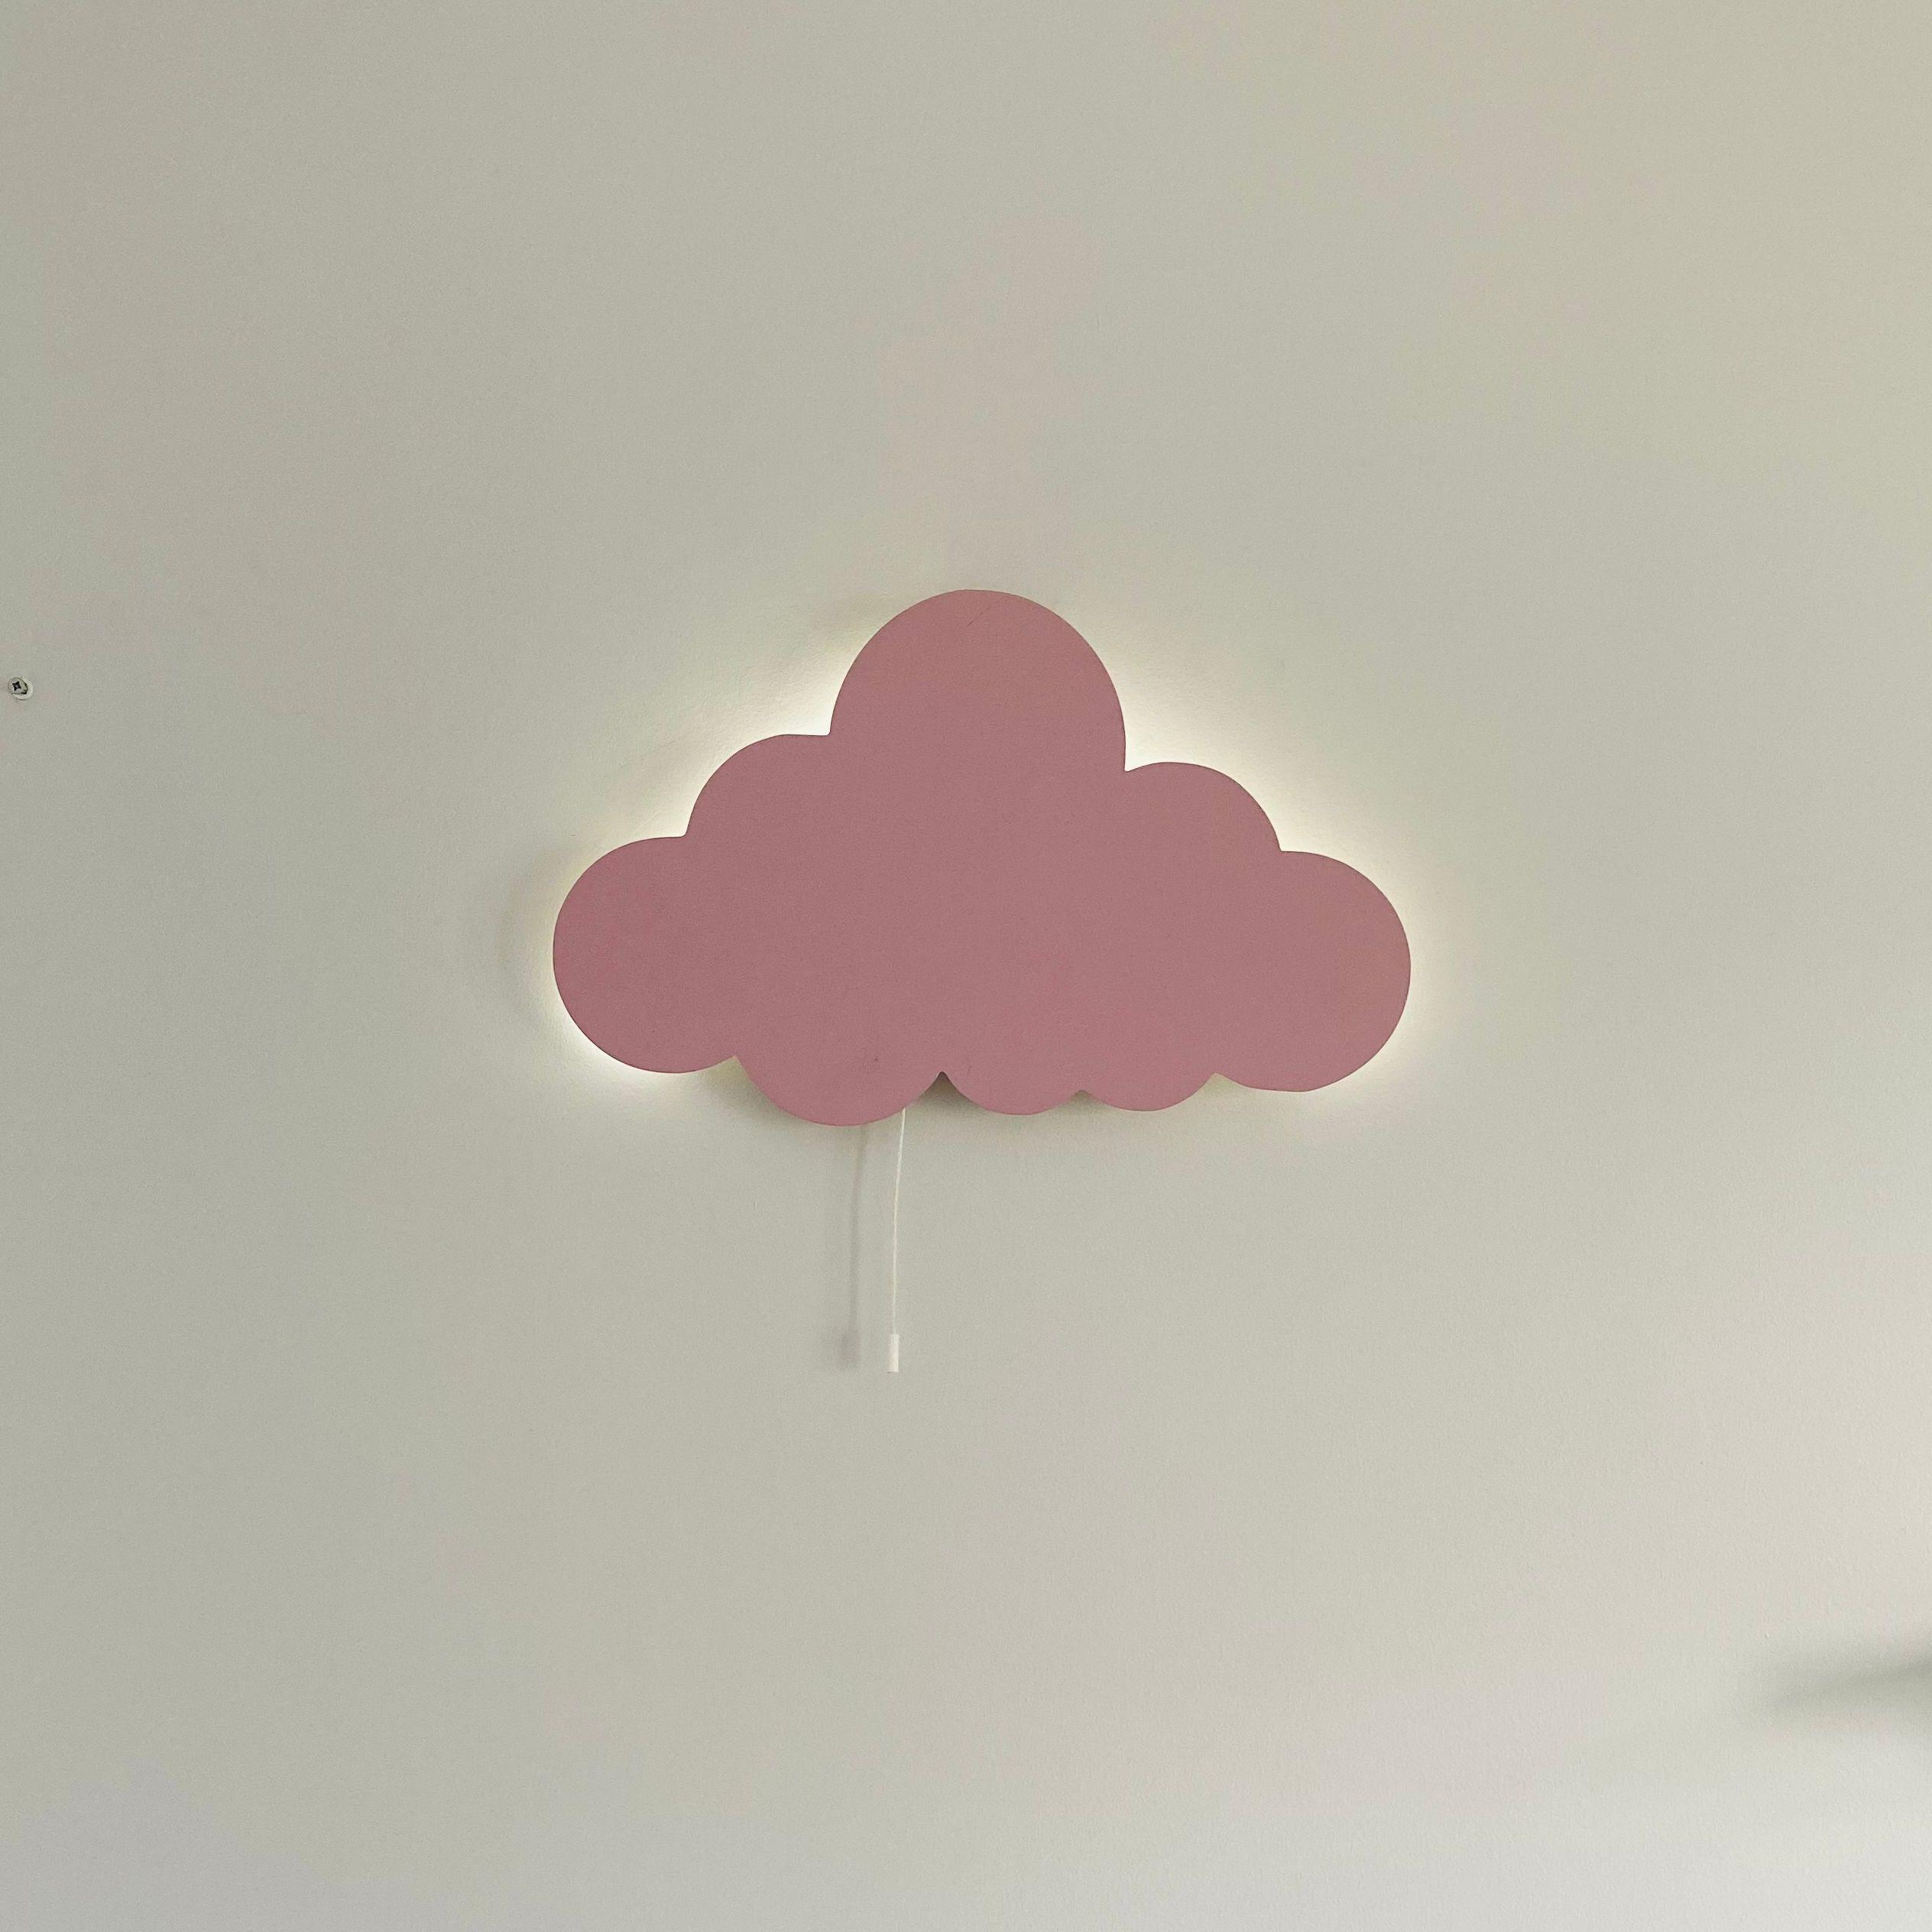 Set of 2- Nursery Night Light, Moon Wall Lamp Cloud Light Baby Bedroom Decor Wooden Led Lampion Wooden Lamps Kids Lamp enlarge